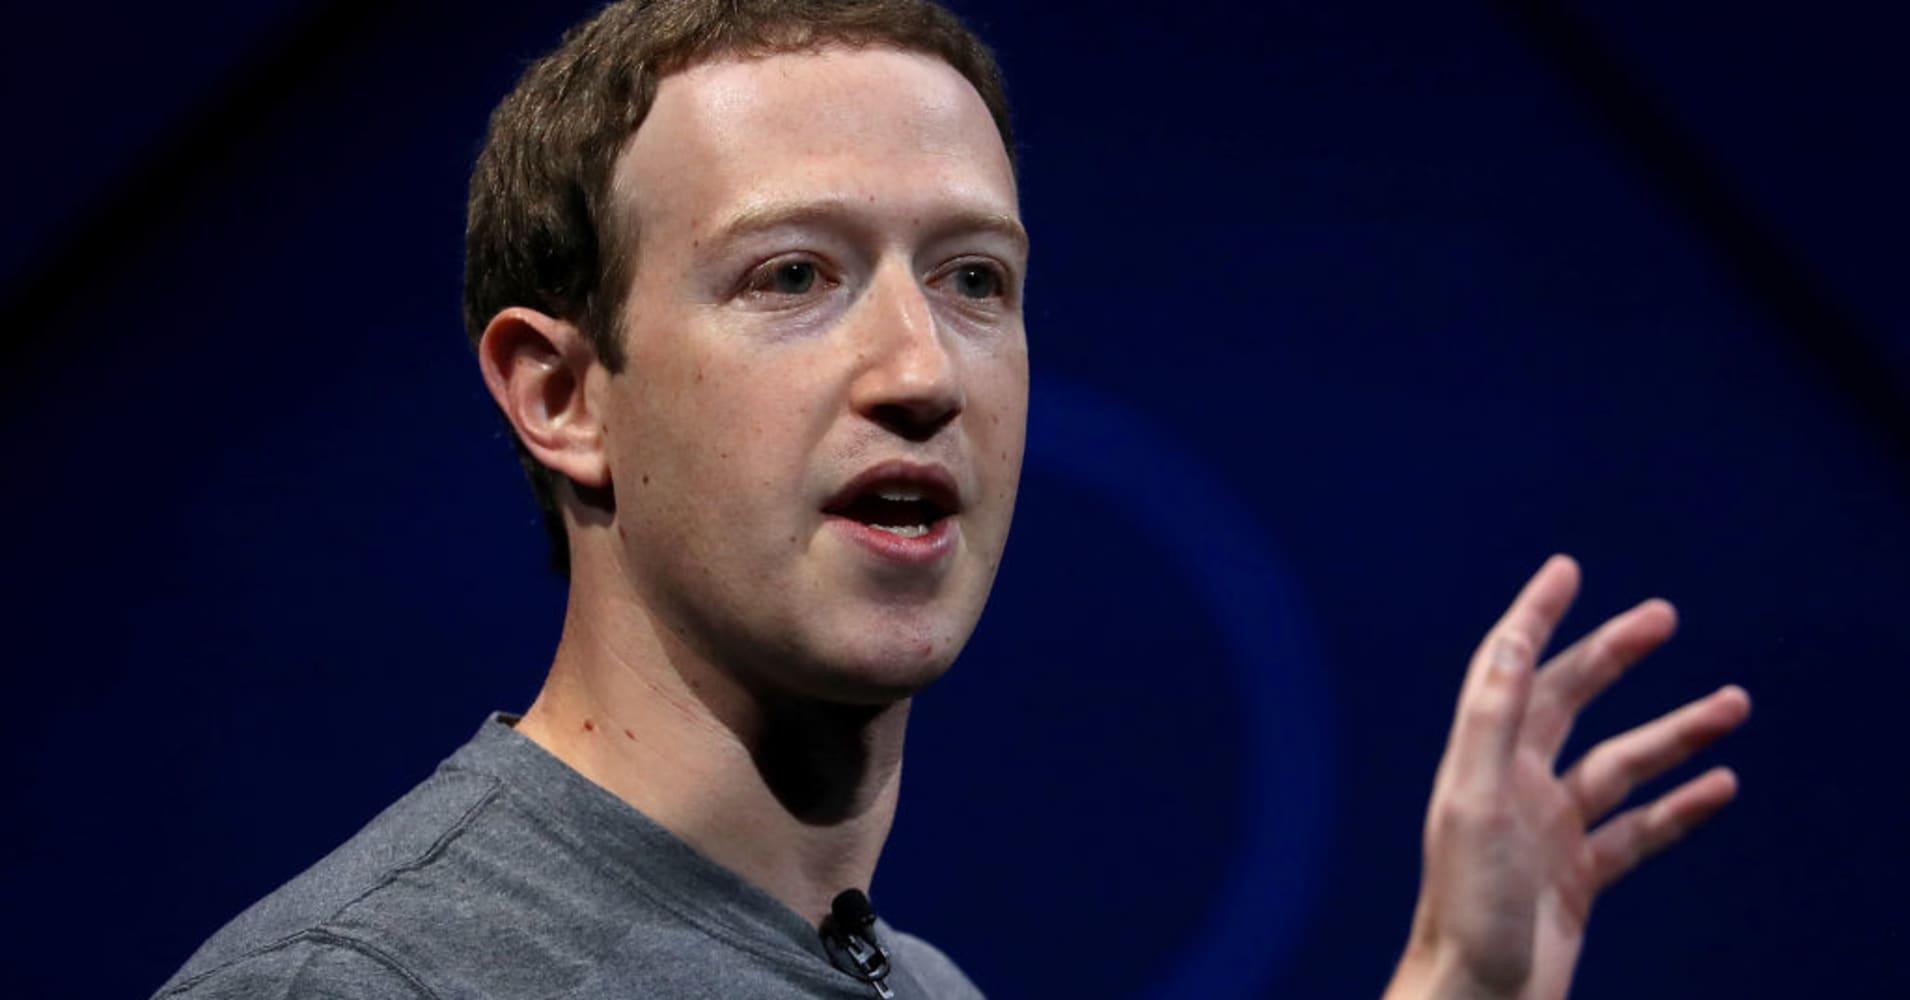 Mark Zuckerberg, CEO of Facebook